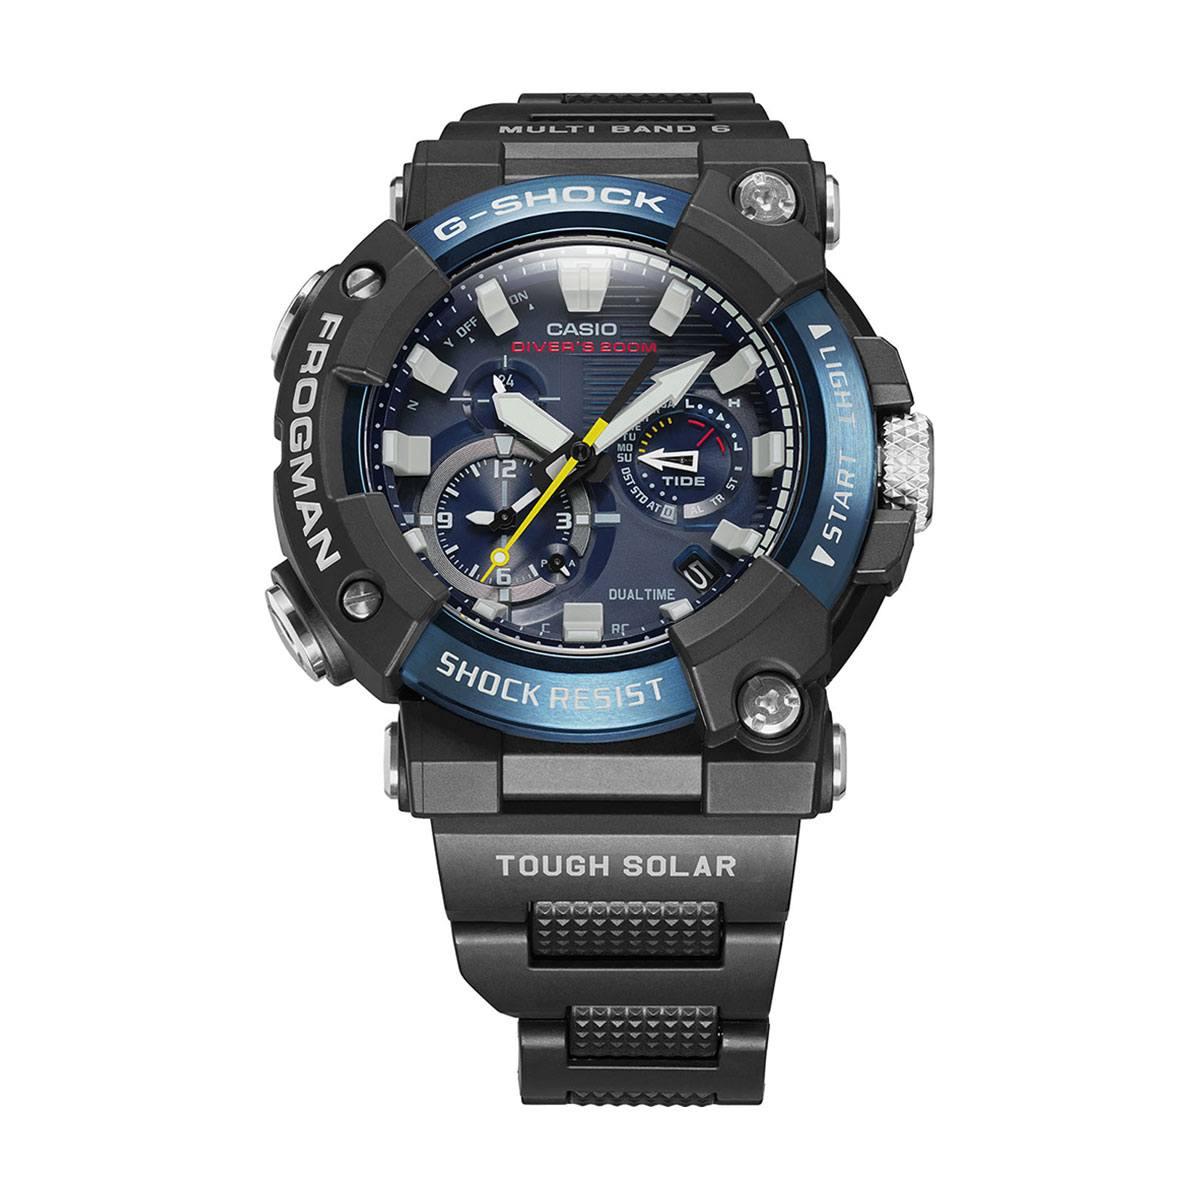 Часовник Casio G-Shock Frogmaster GWF-A1000C-1AER